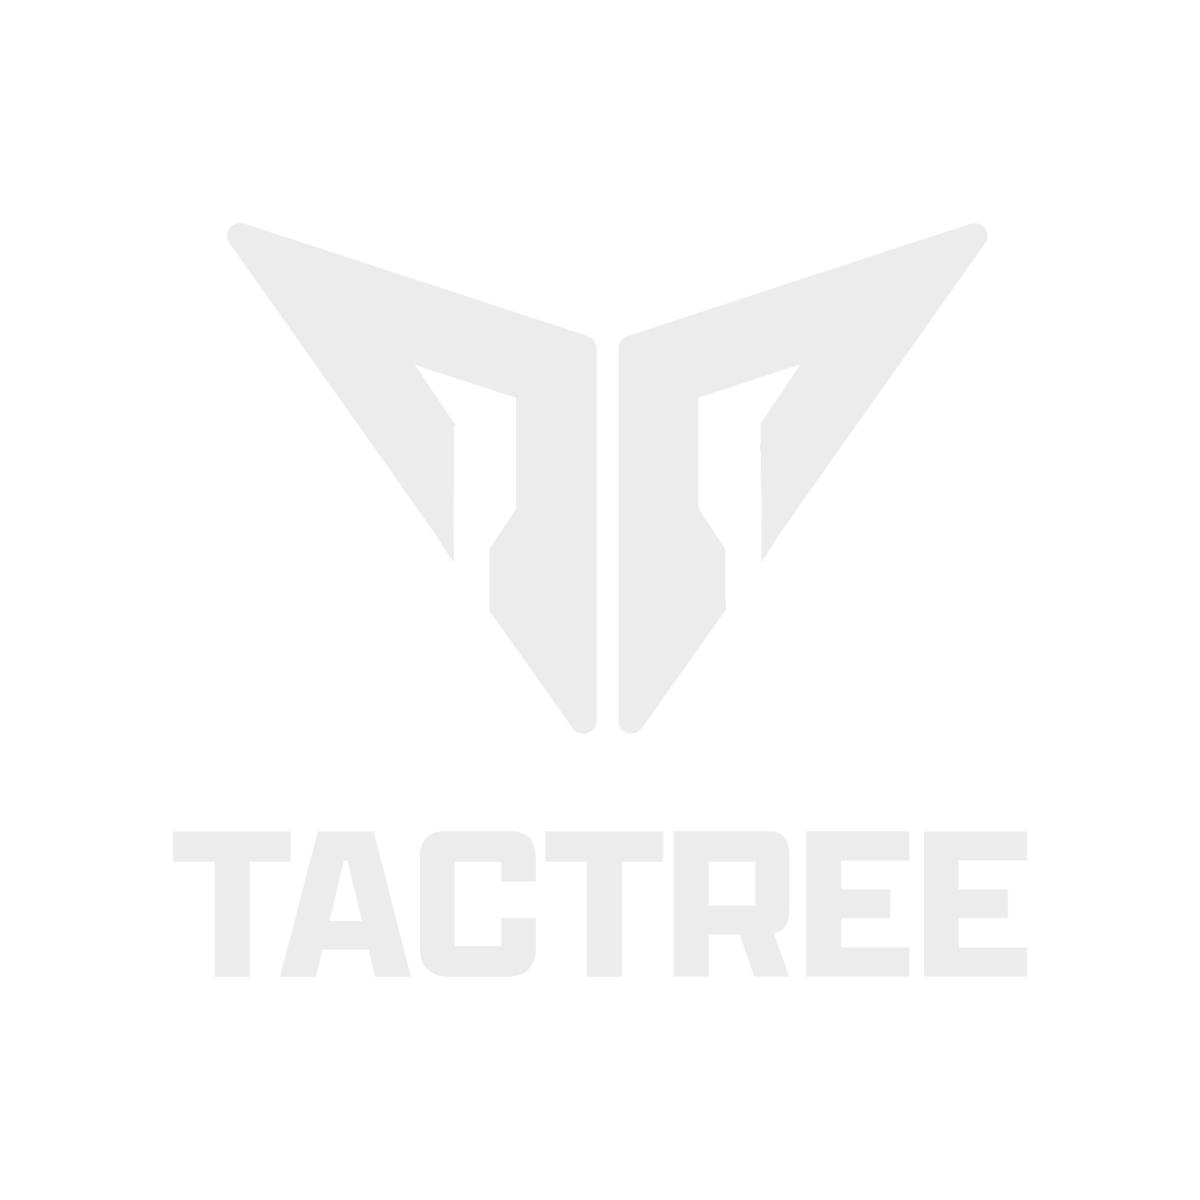 Ebiox Trionic Surface Disinfectant (5 Litre)